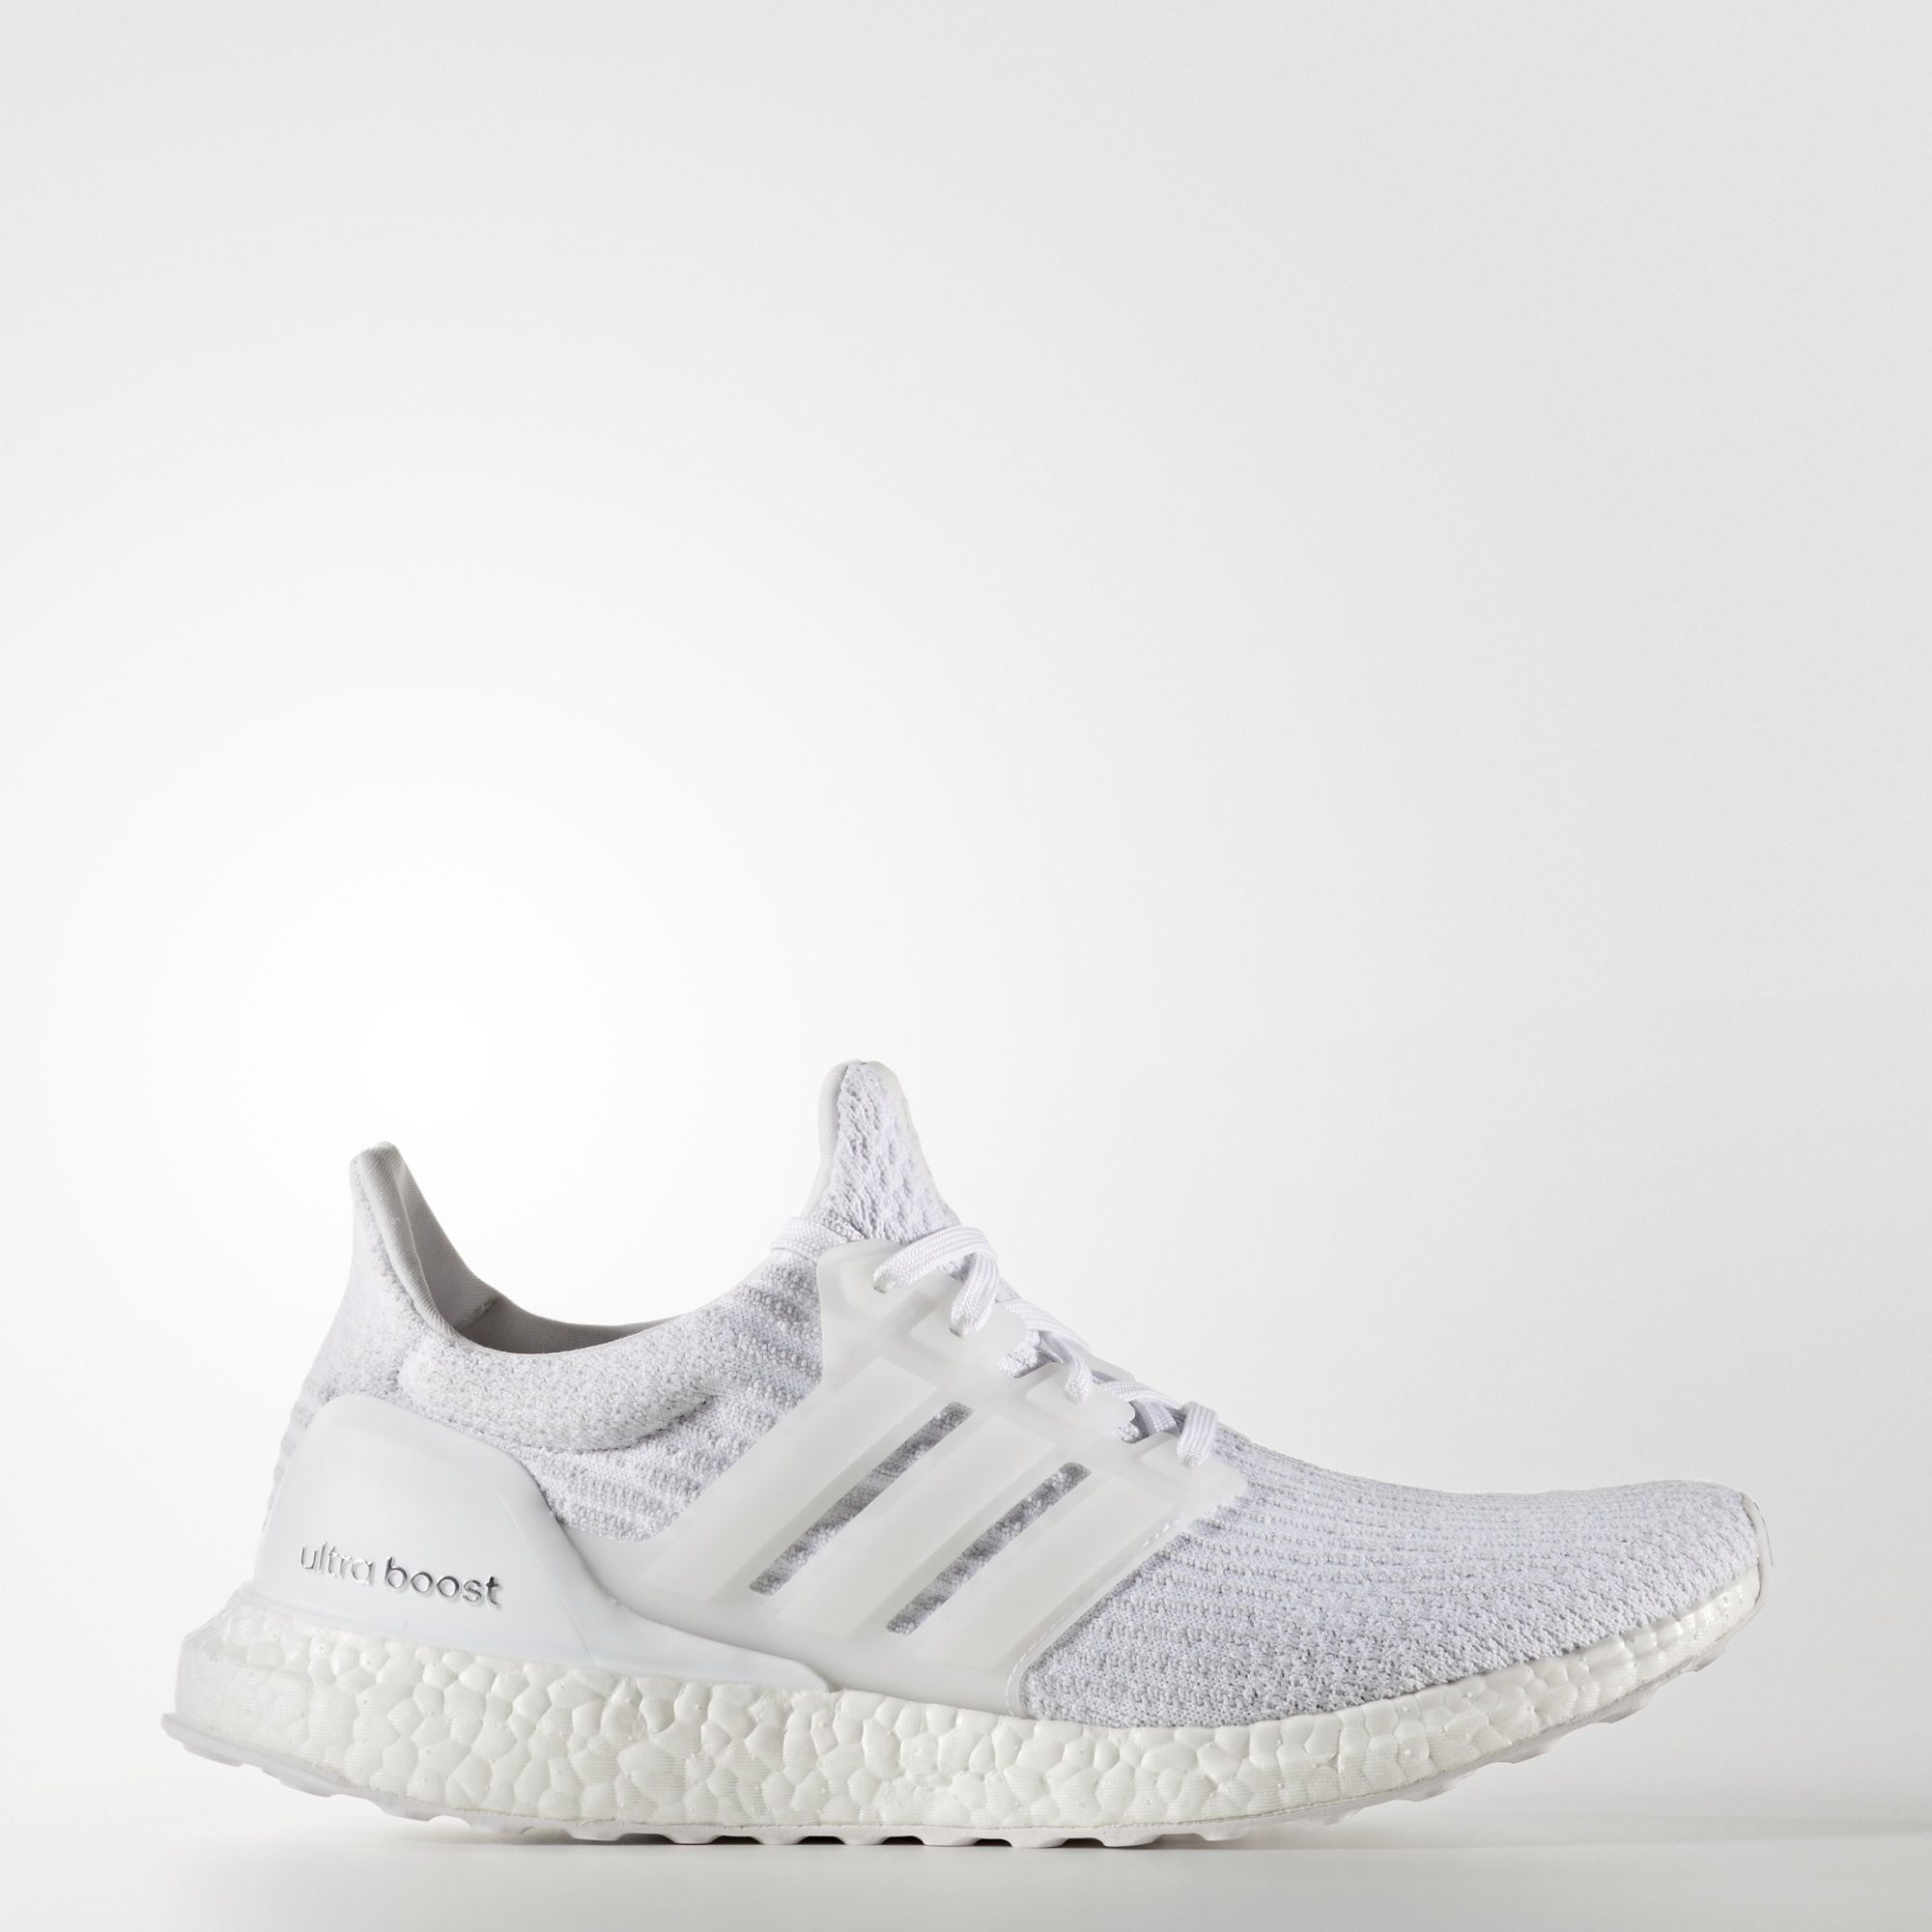 adidas ultra boost blanc allow project.eu